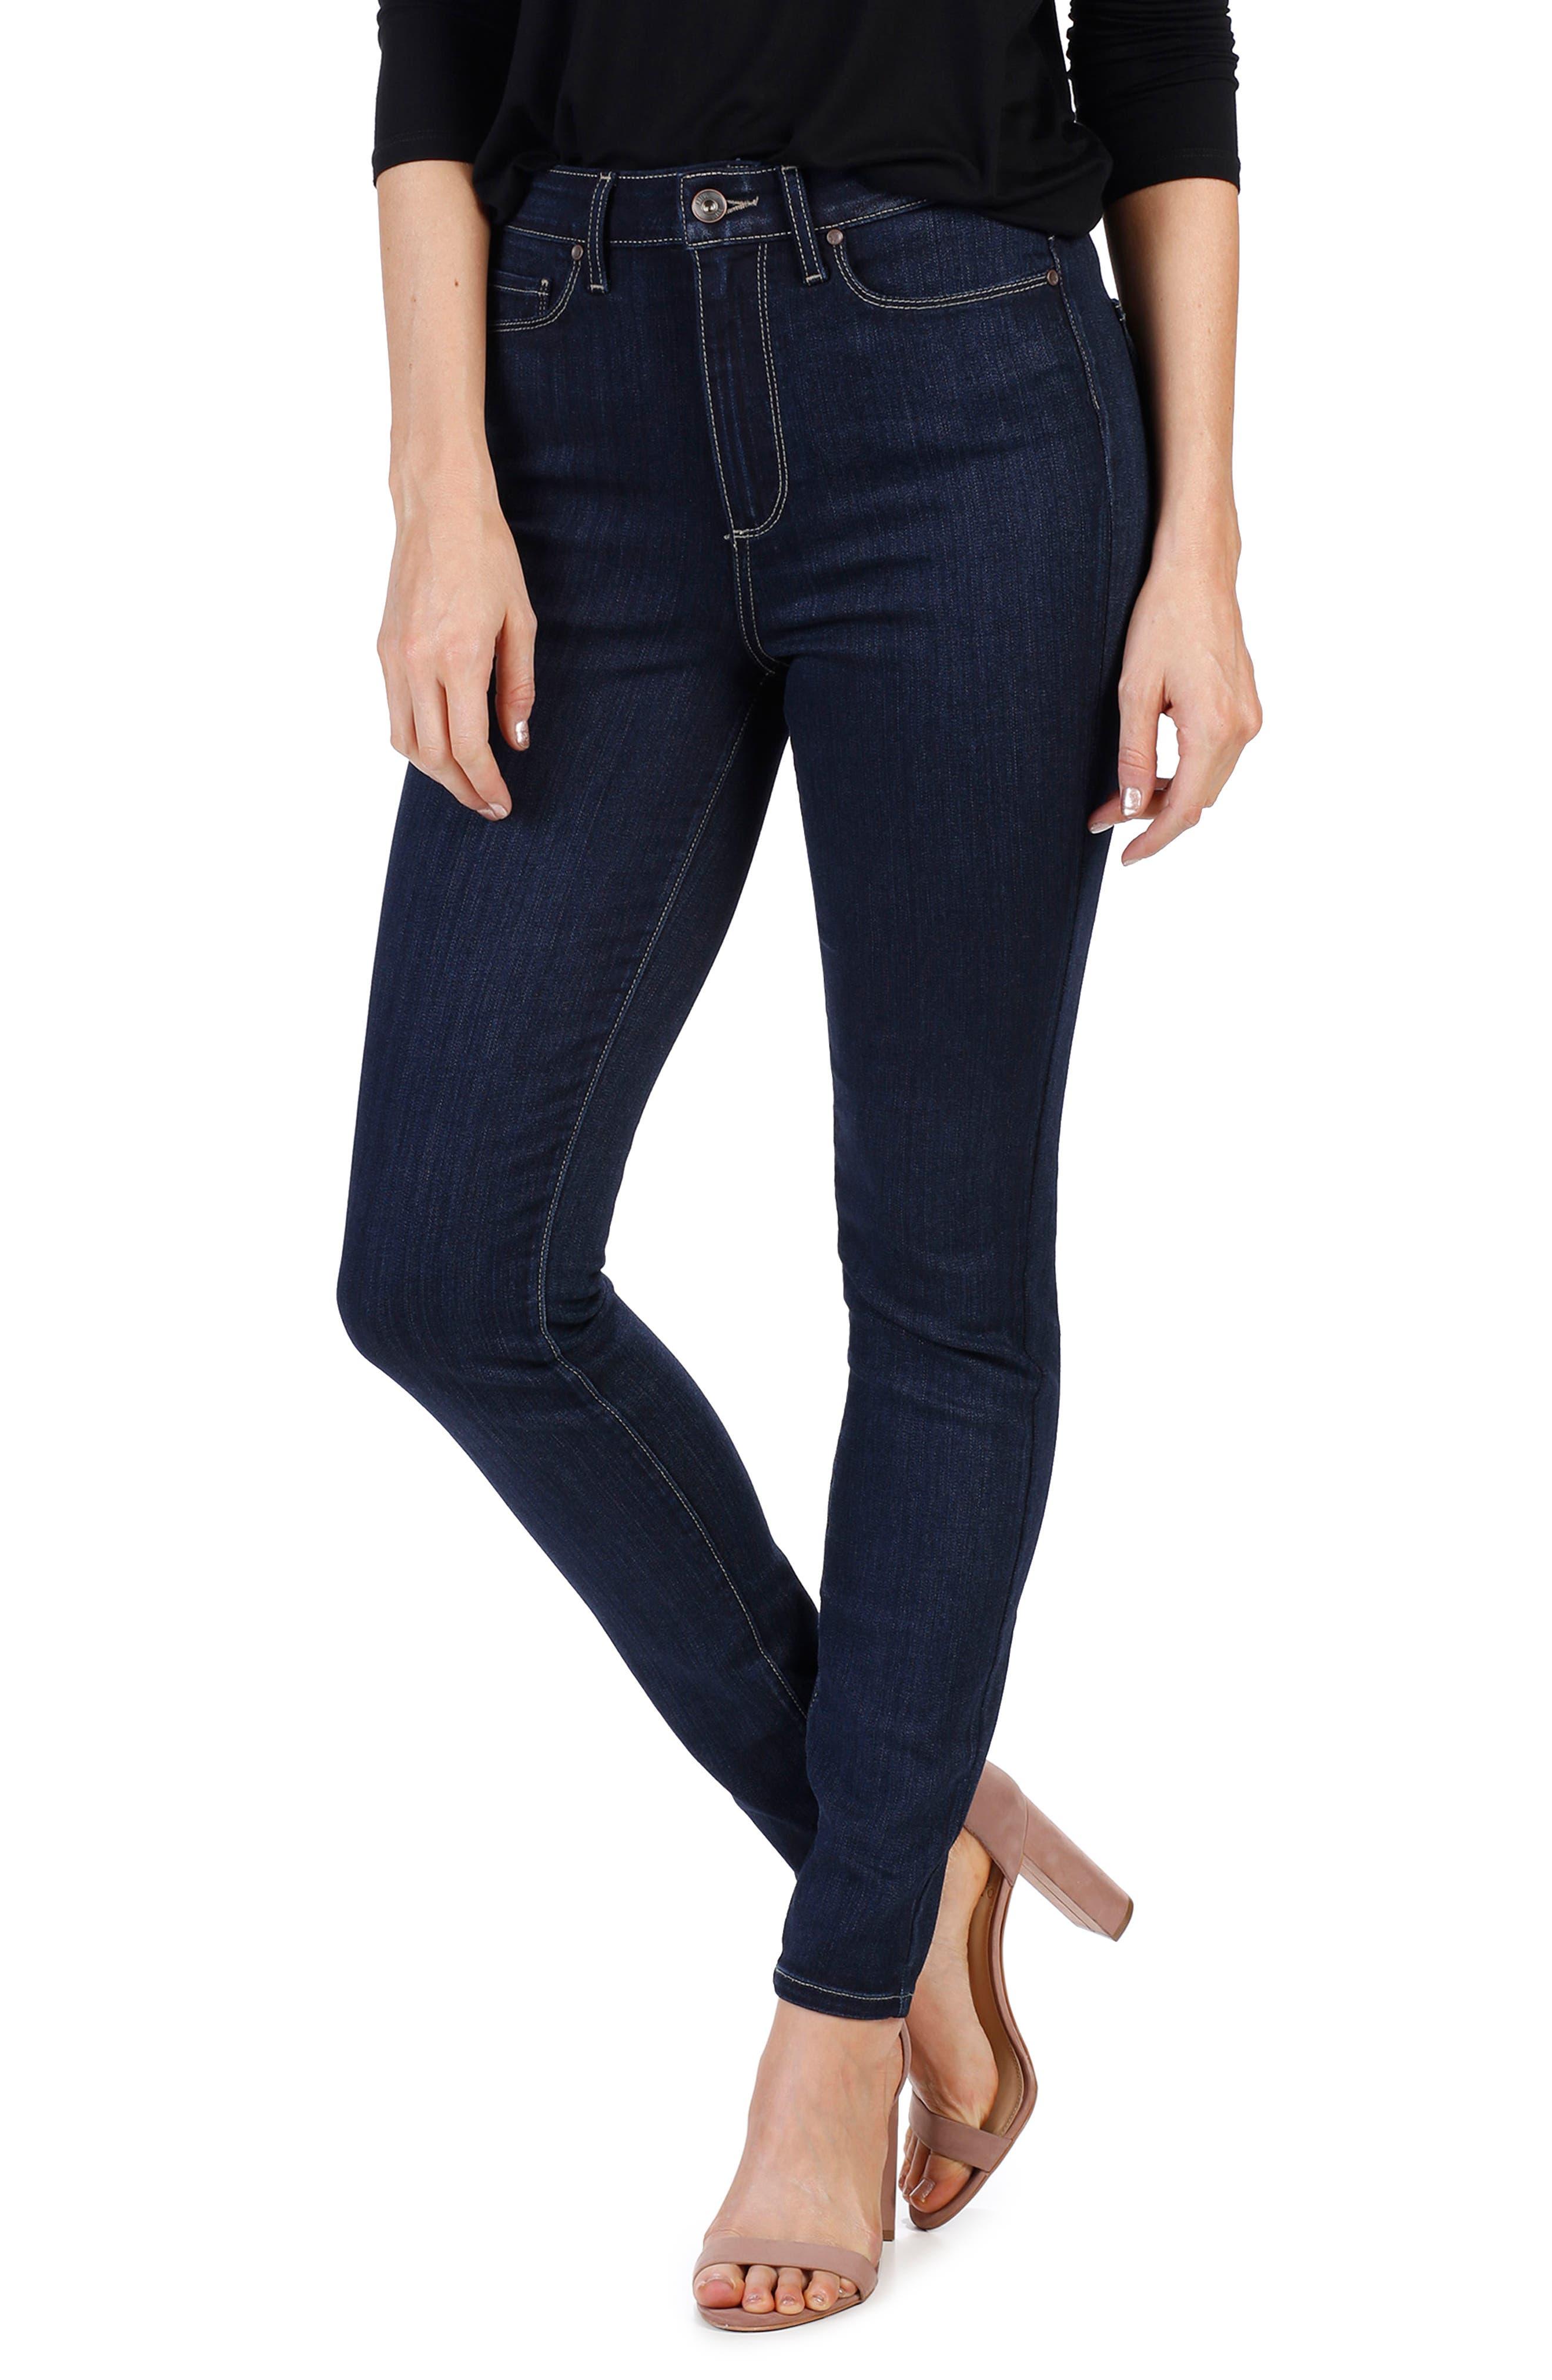 PAIGE Transcend - Margot High Waist Ultra Skinny Jeans (Becklyn)